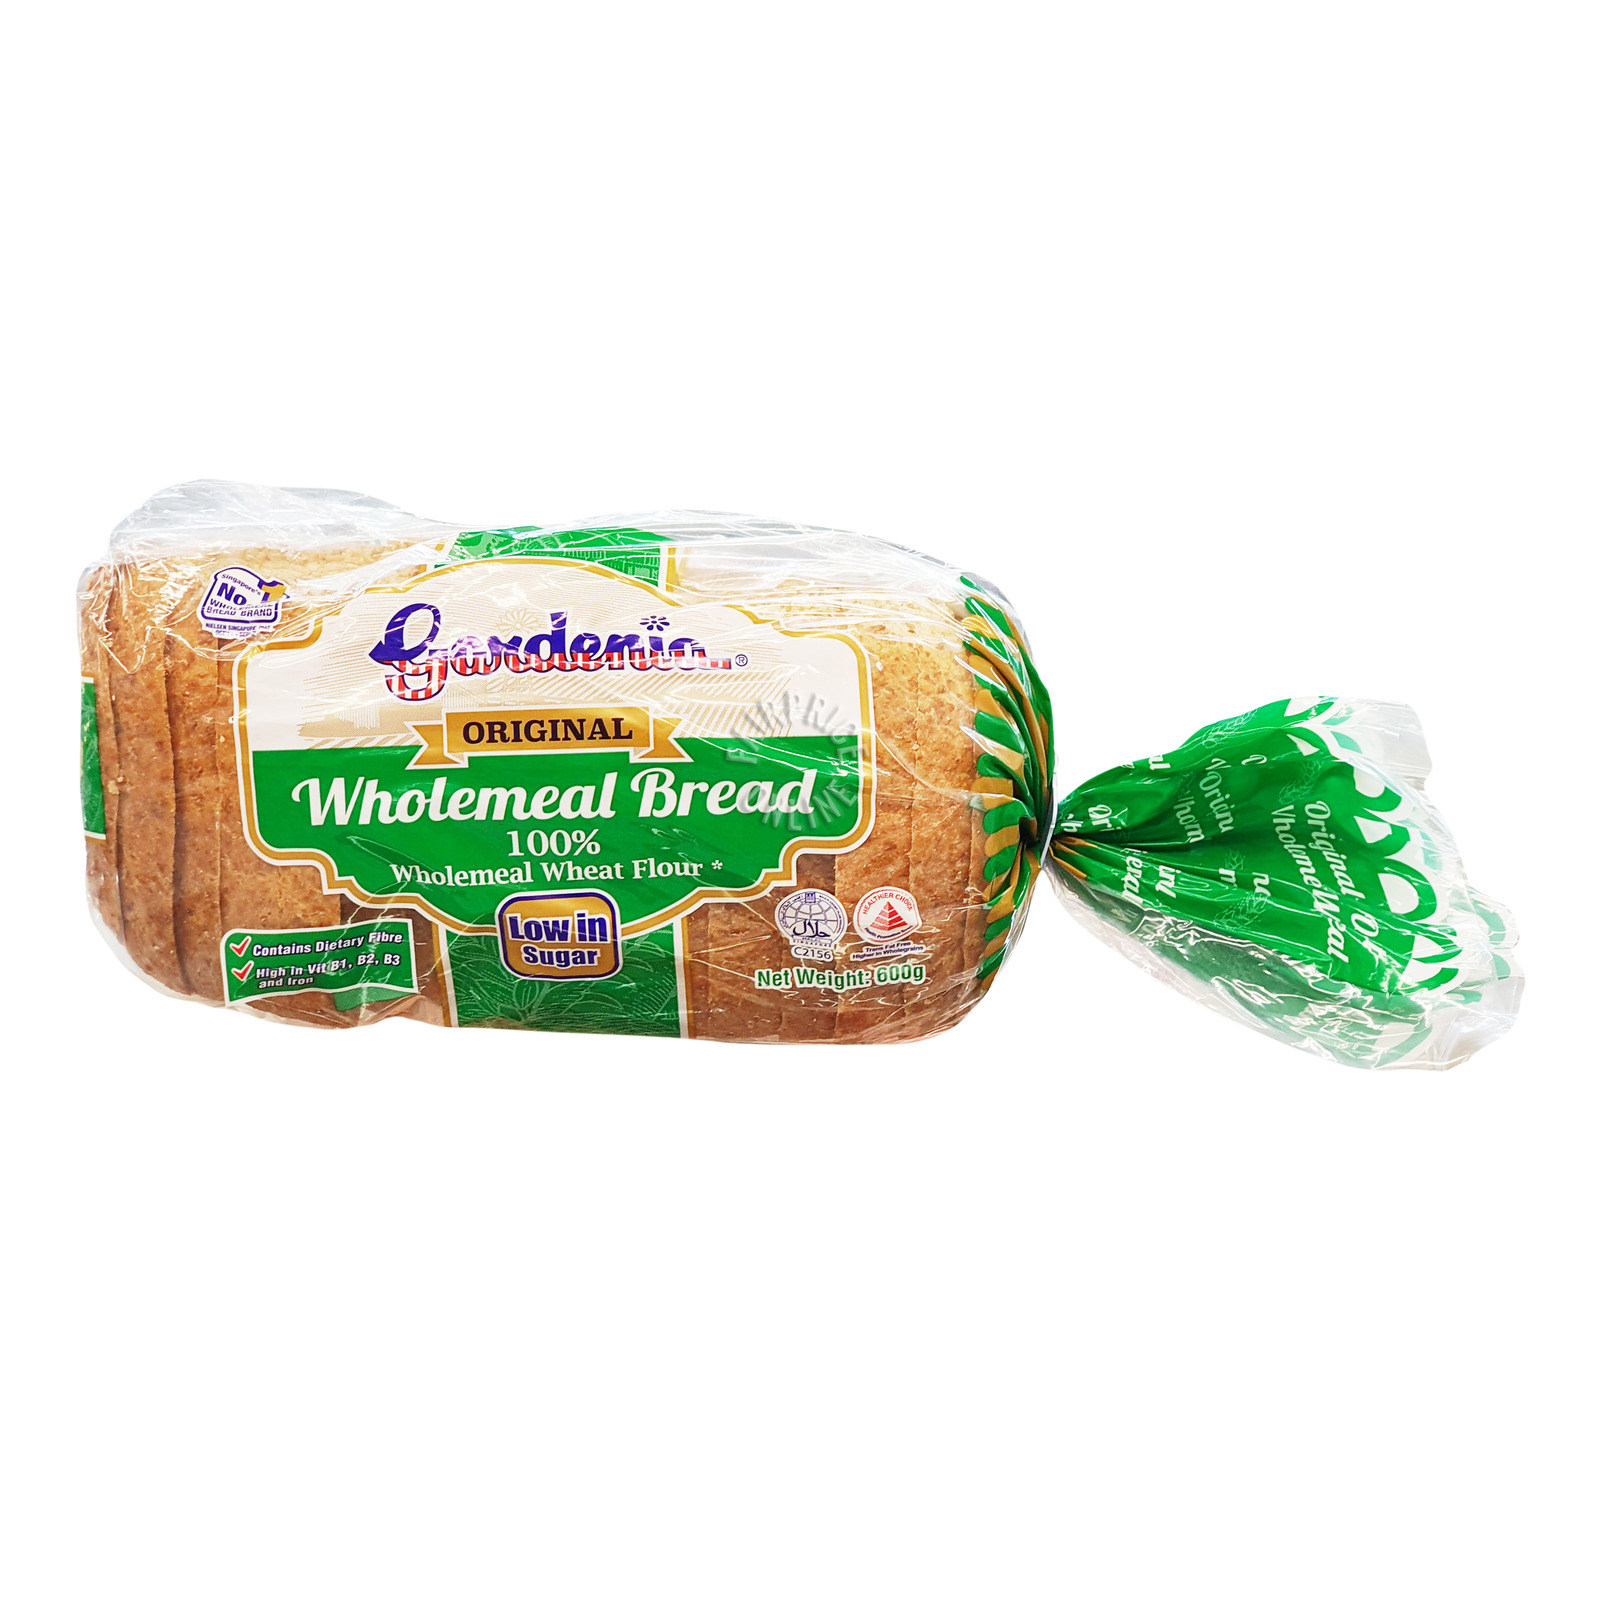 Gardenia Wholemeal Bread - Original